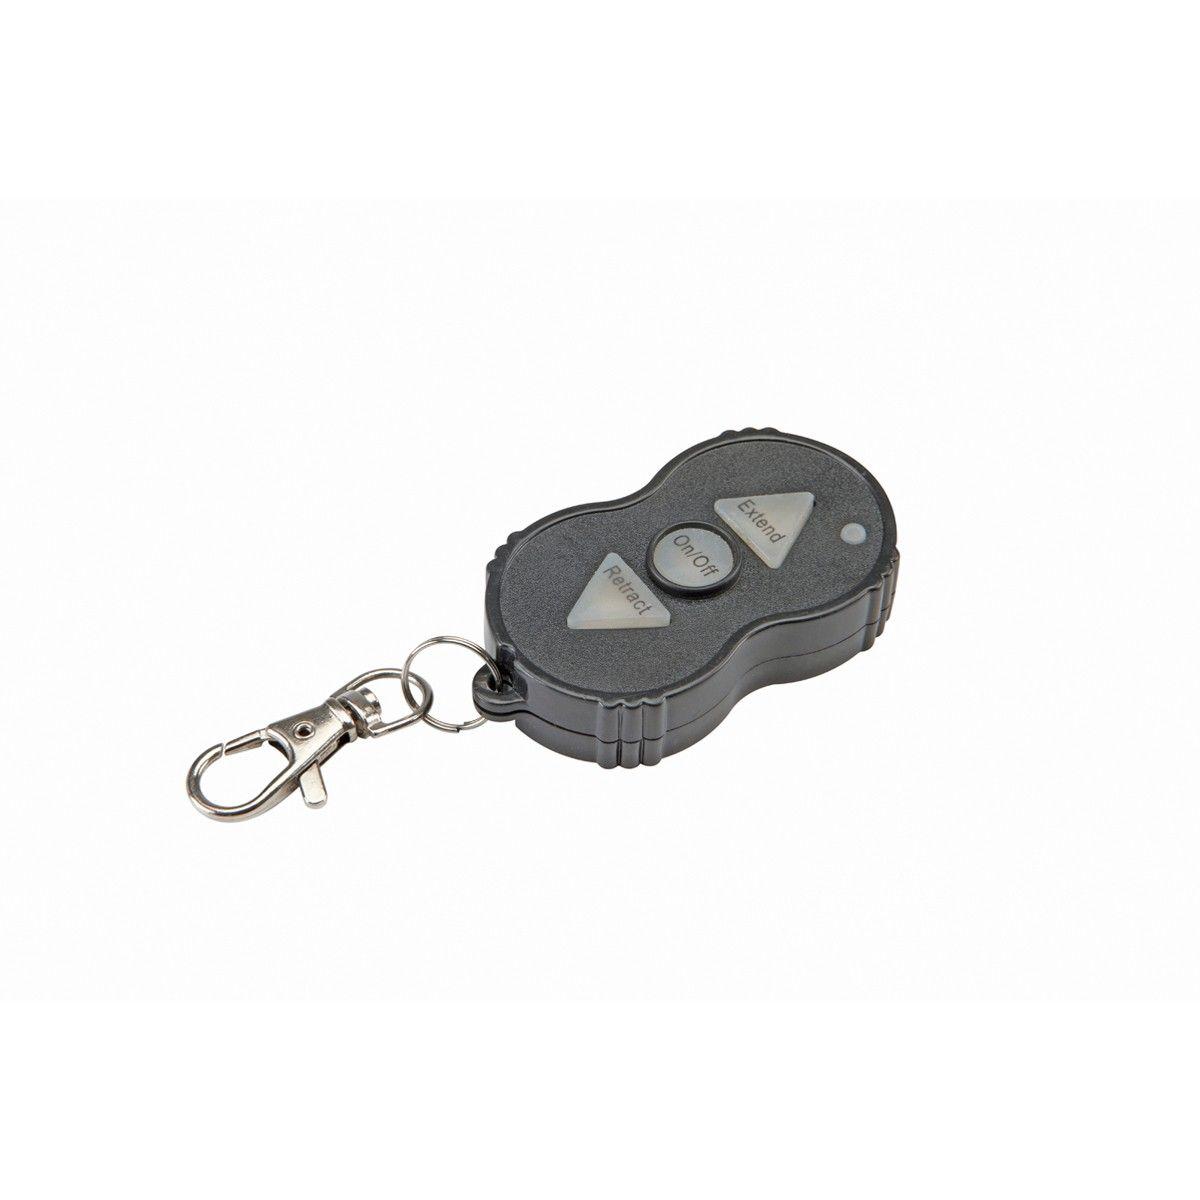 atv utility electric winch with wireless remote control [ 1200 x 1200 Pixel ]